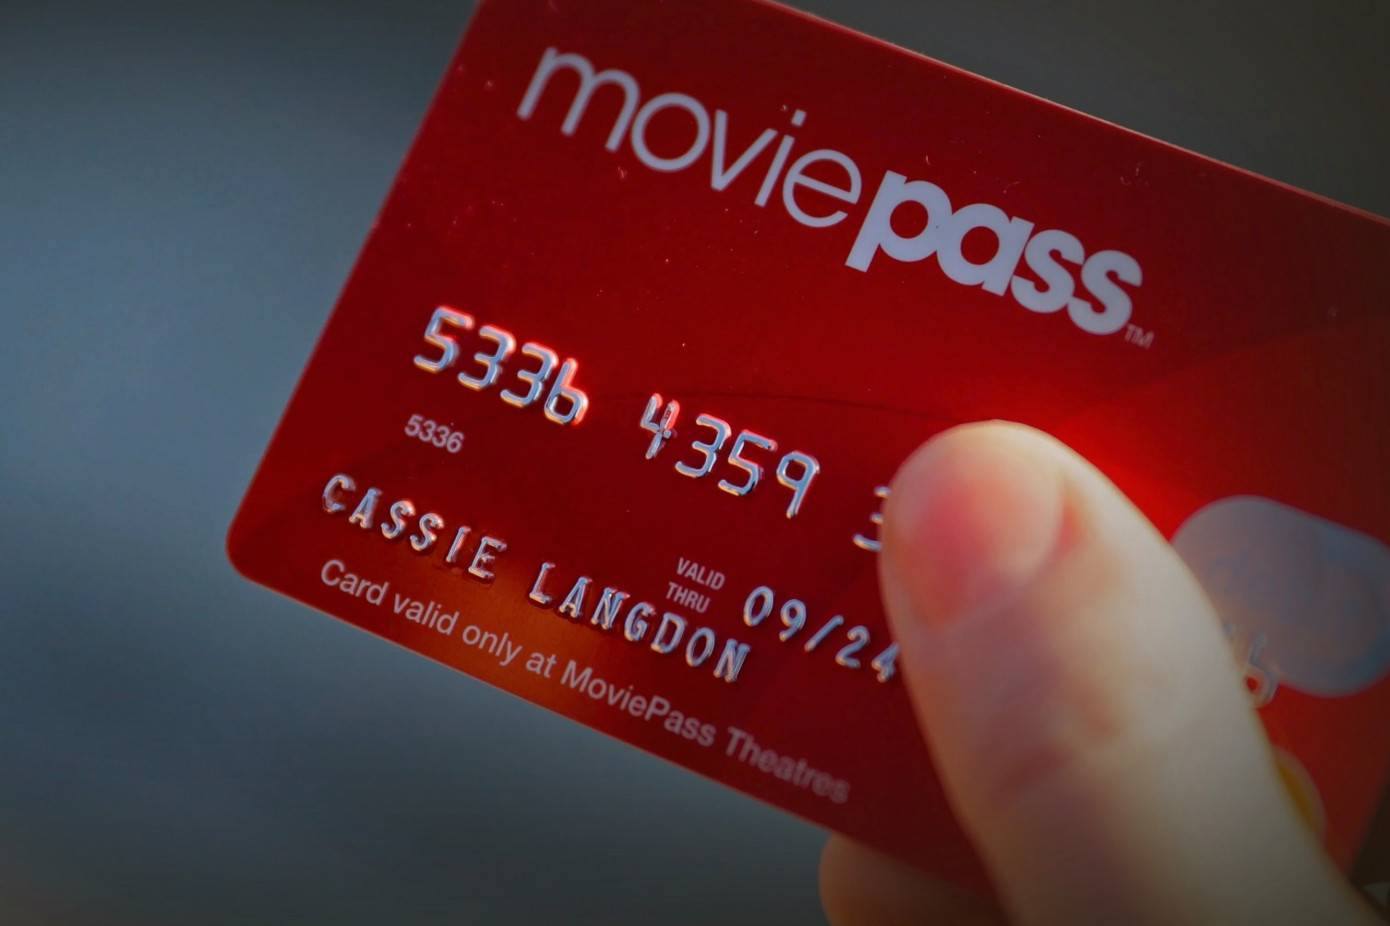 MoviePass's movie ticket subscription service